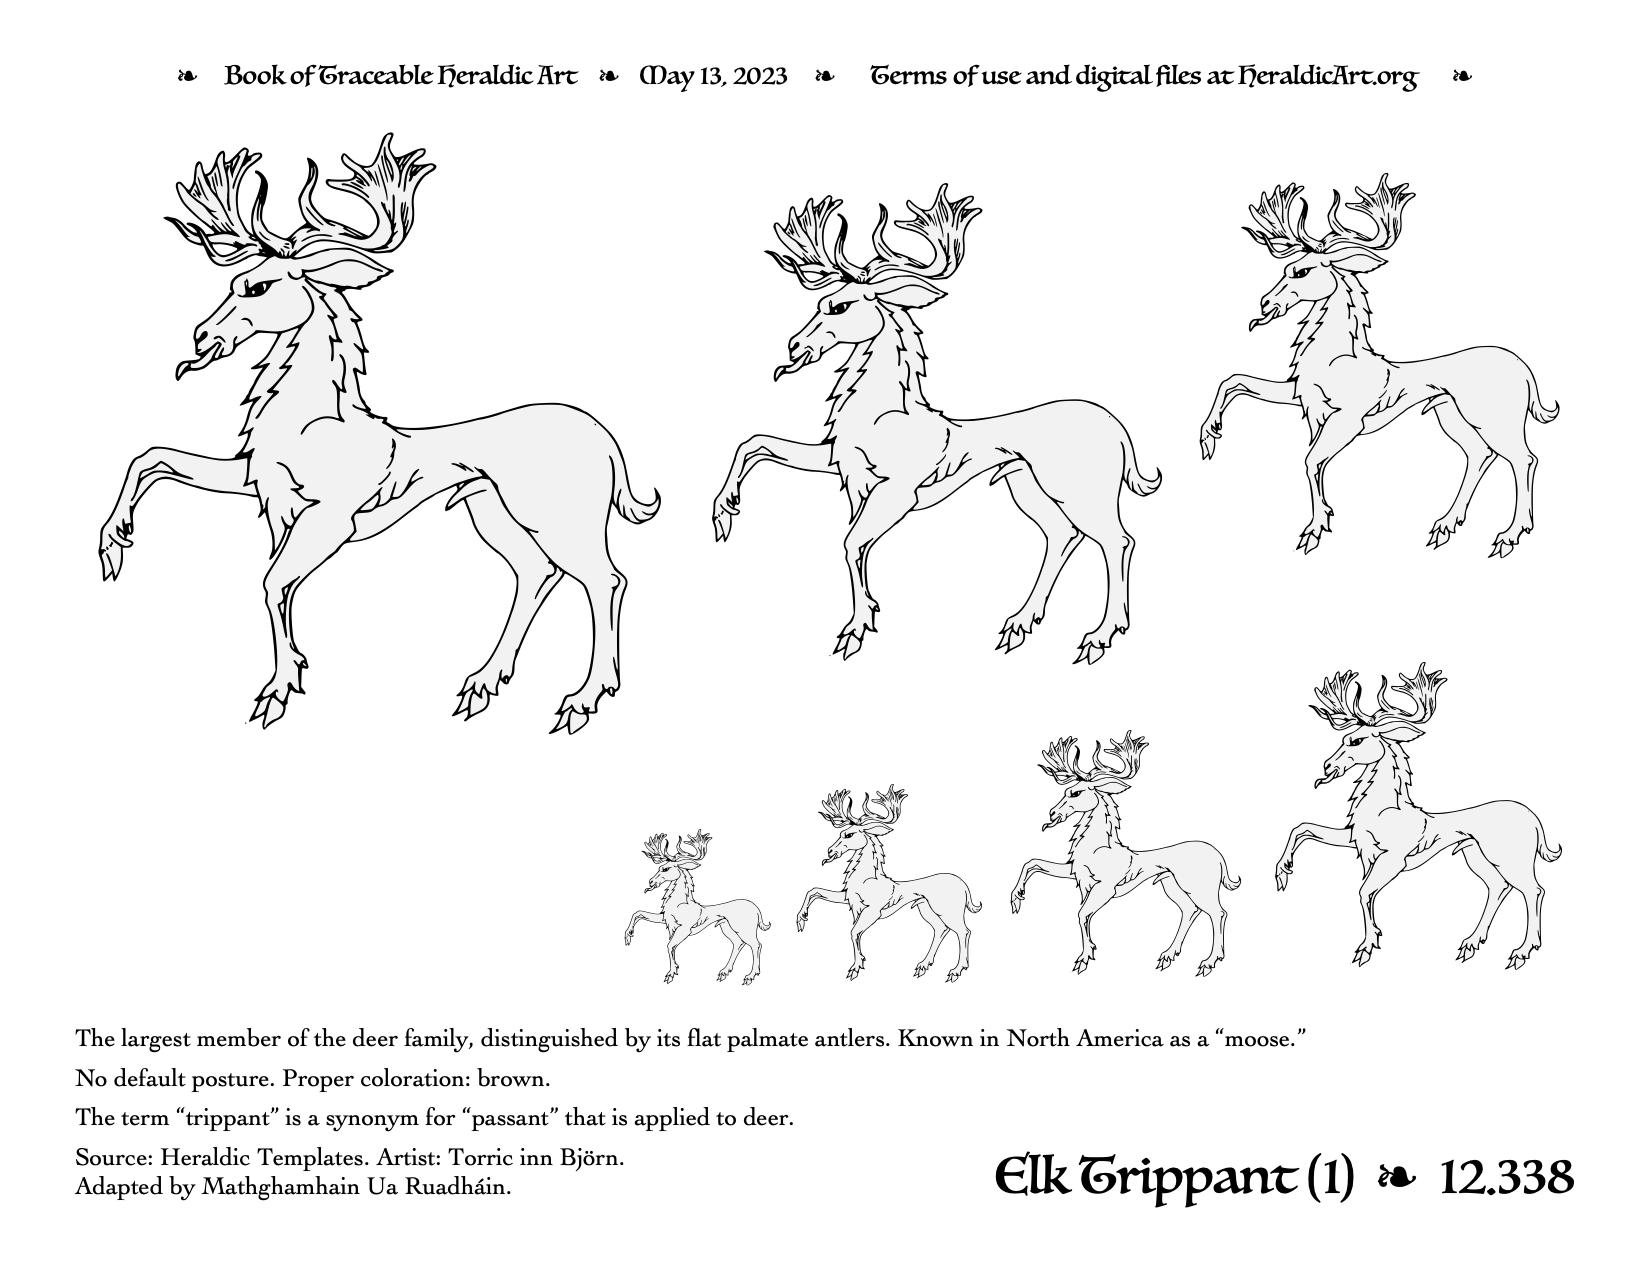 Trippant - Traceable Heraldic Art